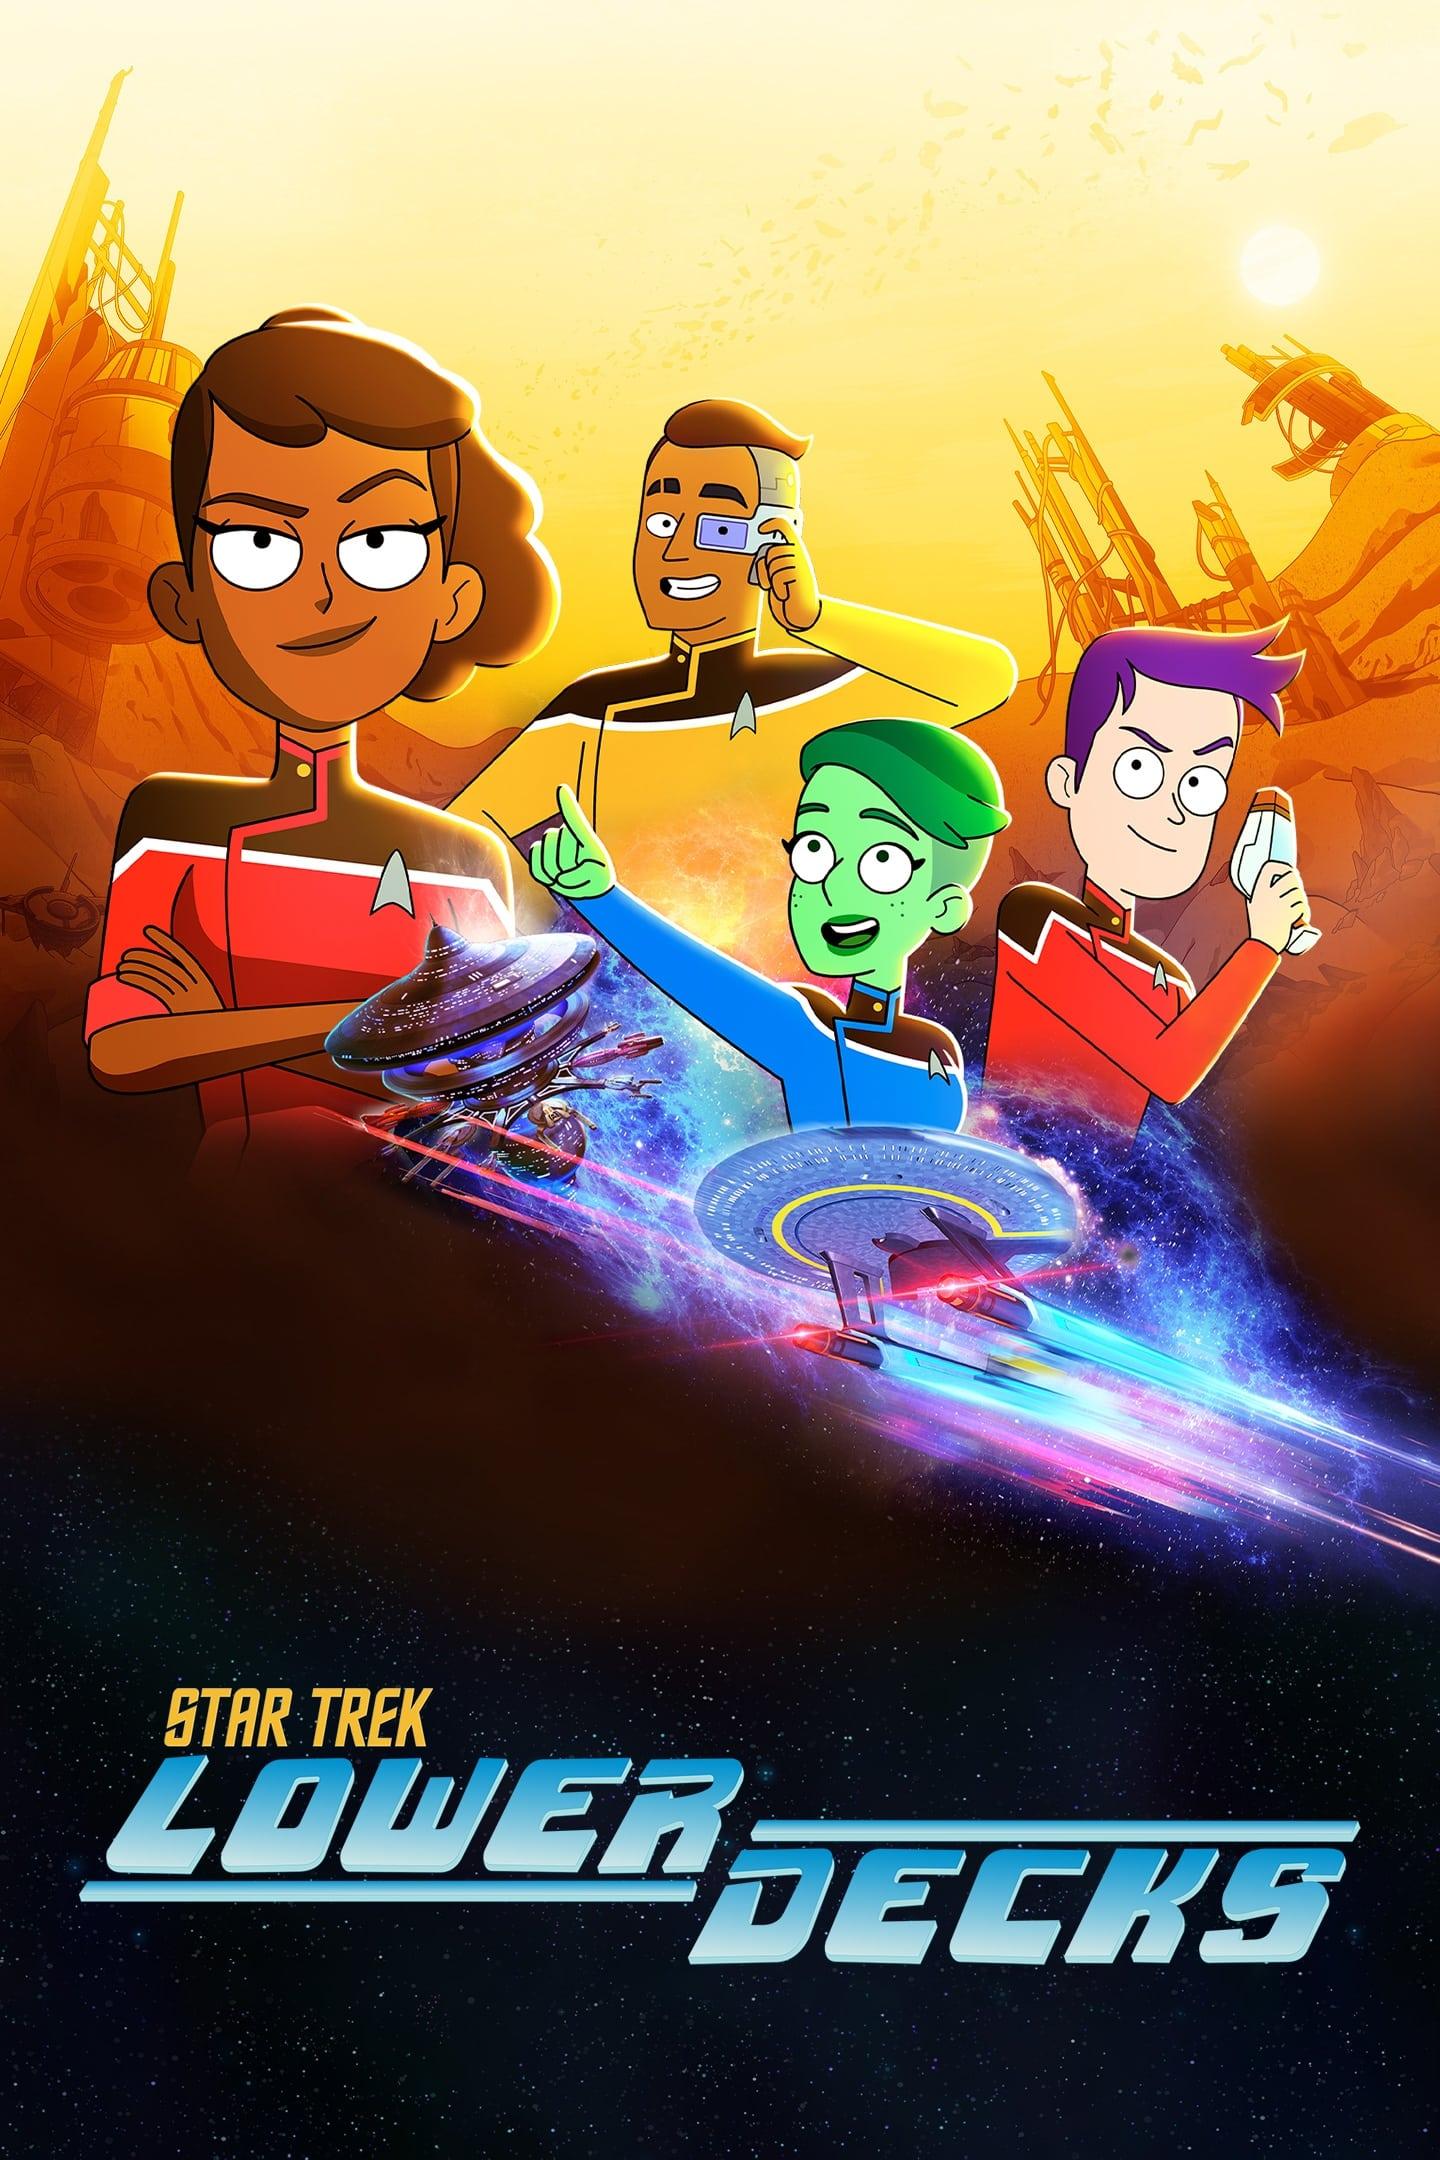 Star Trek: Lower Decks TV Shows About Alien Planet